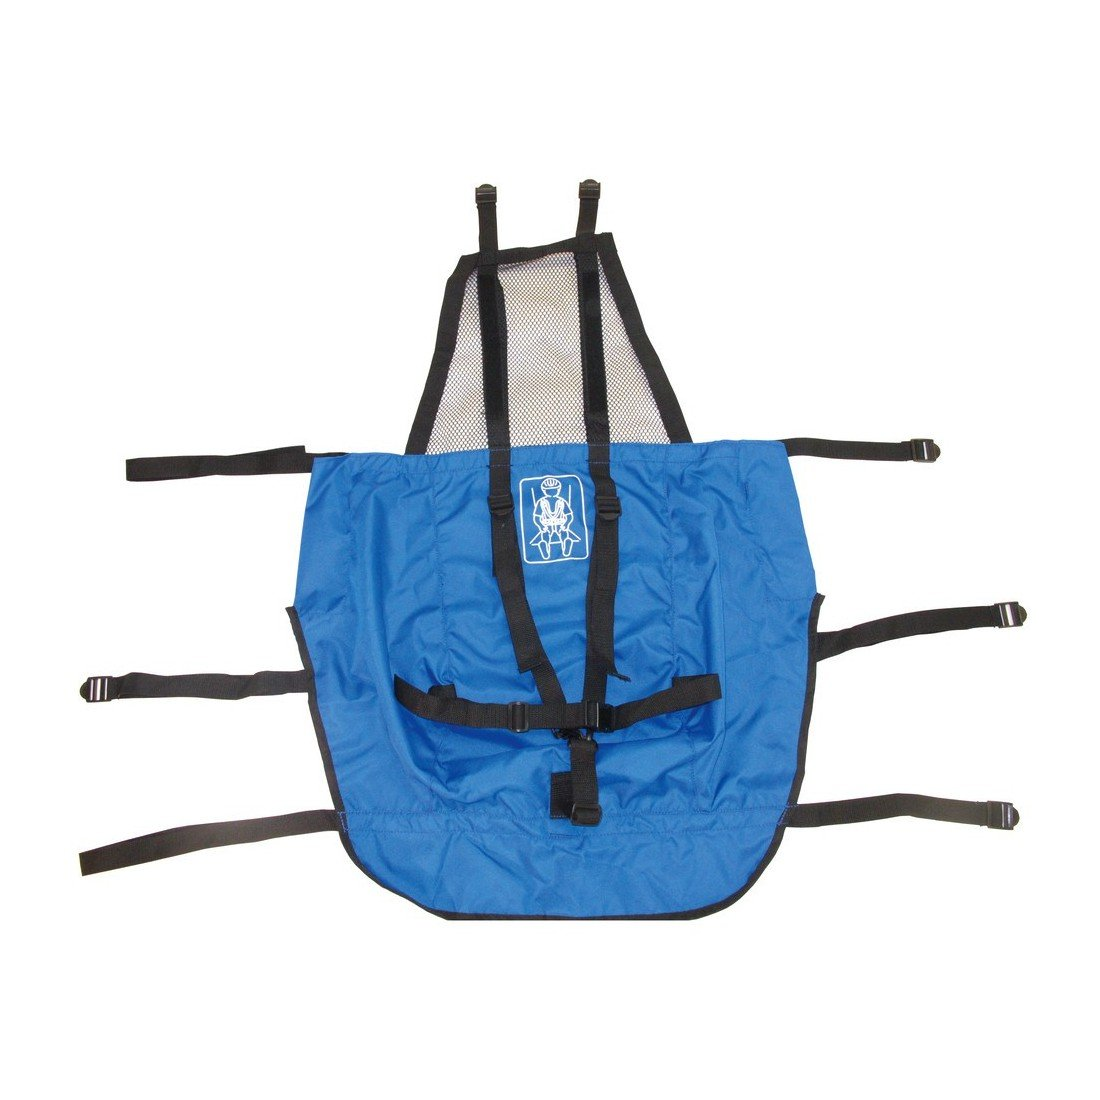 Ersatzsitzbezug f.Kinderanh. XLC Mono für XLC Mono blau ab 2014